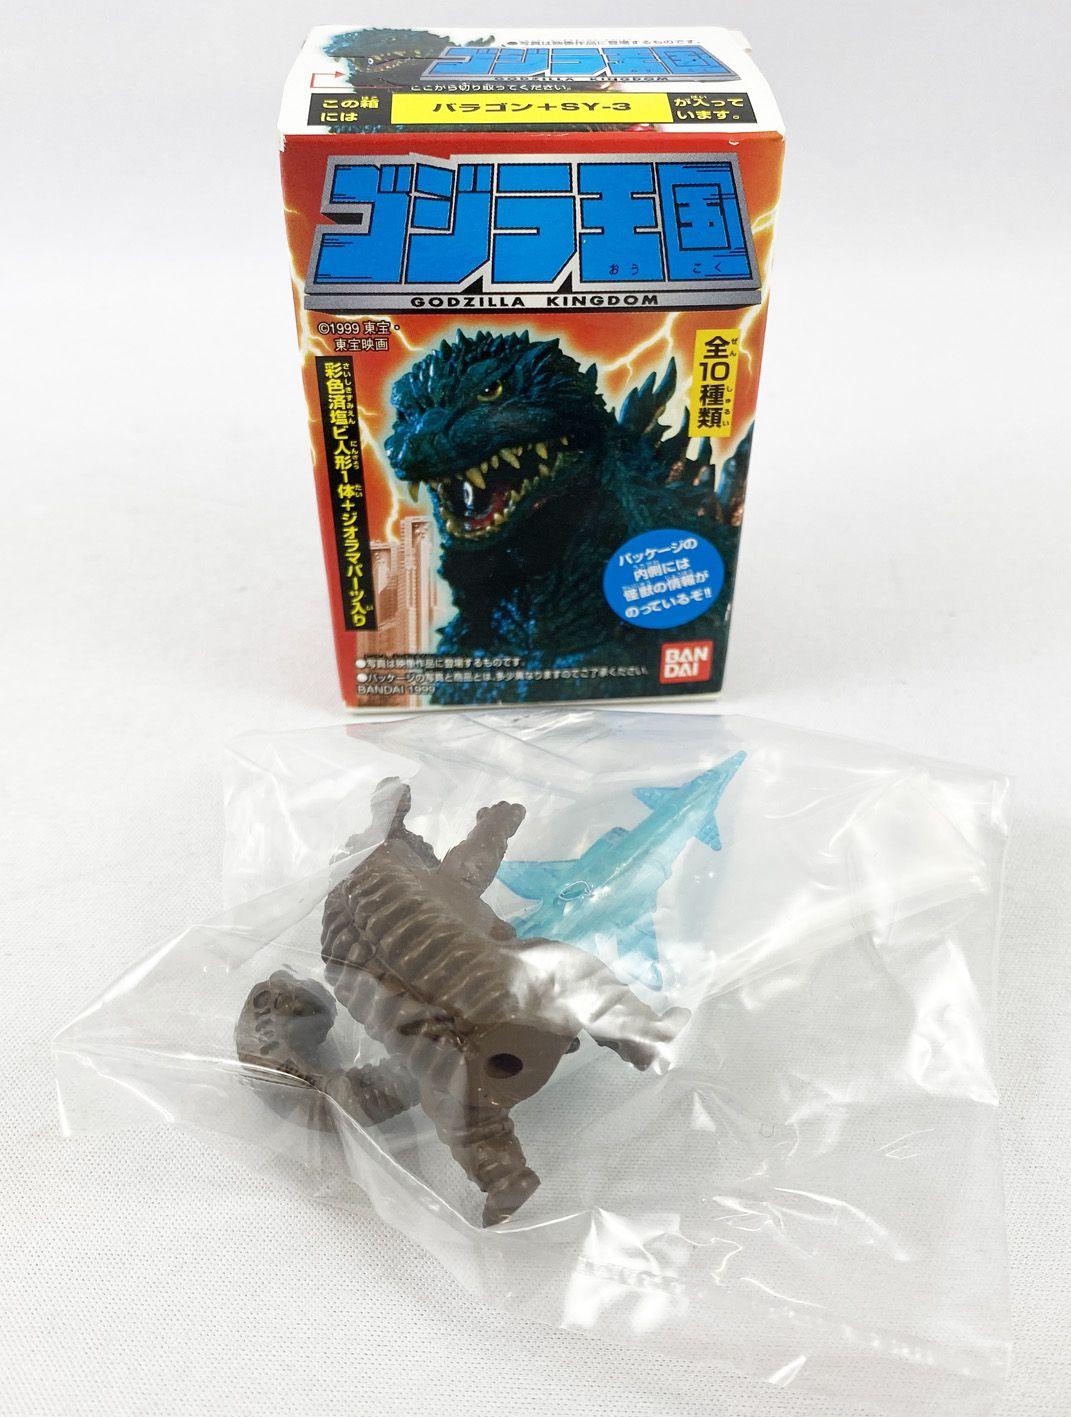 Godzilla - Bandai Gashapon Mini-Figure - Baragon